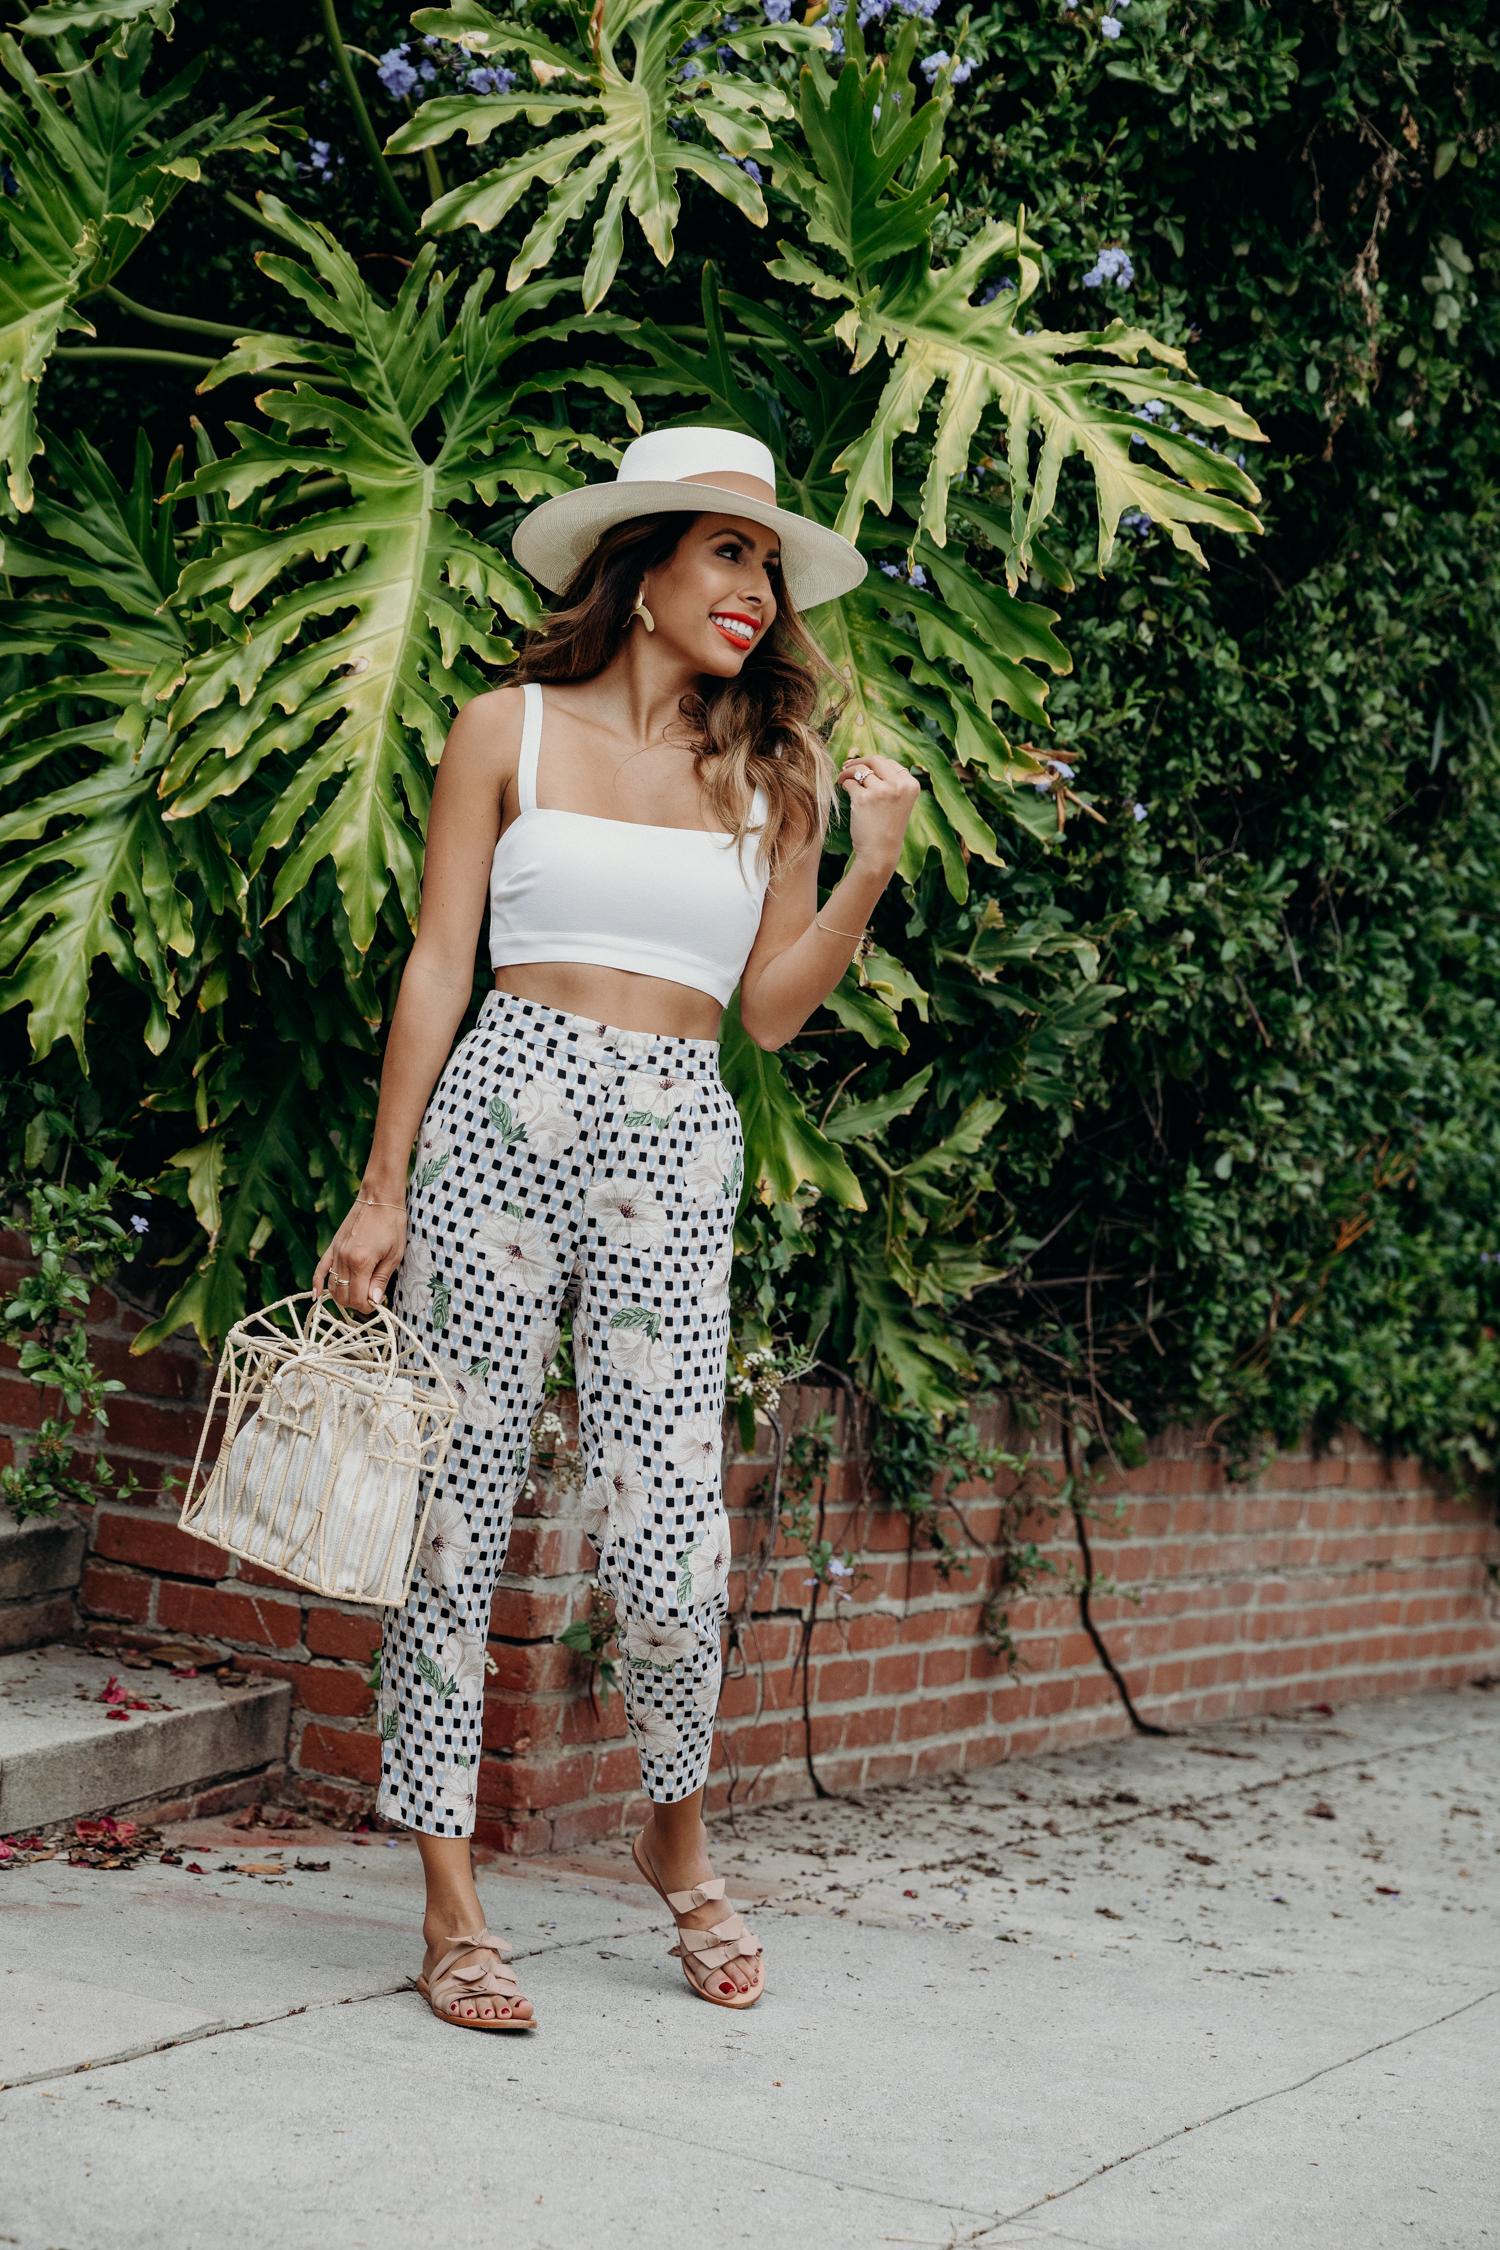 Honeymoon outfit ideas - Belize + Mexico - Sensi Panama Hat - KAANAS Bow sandals